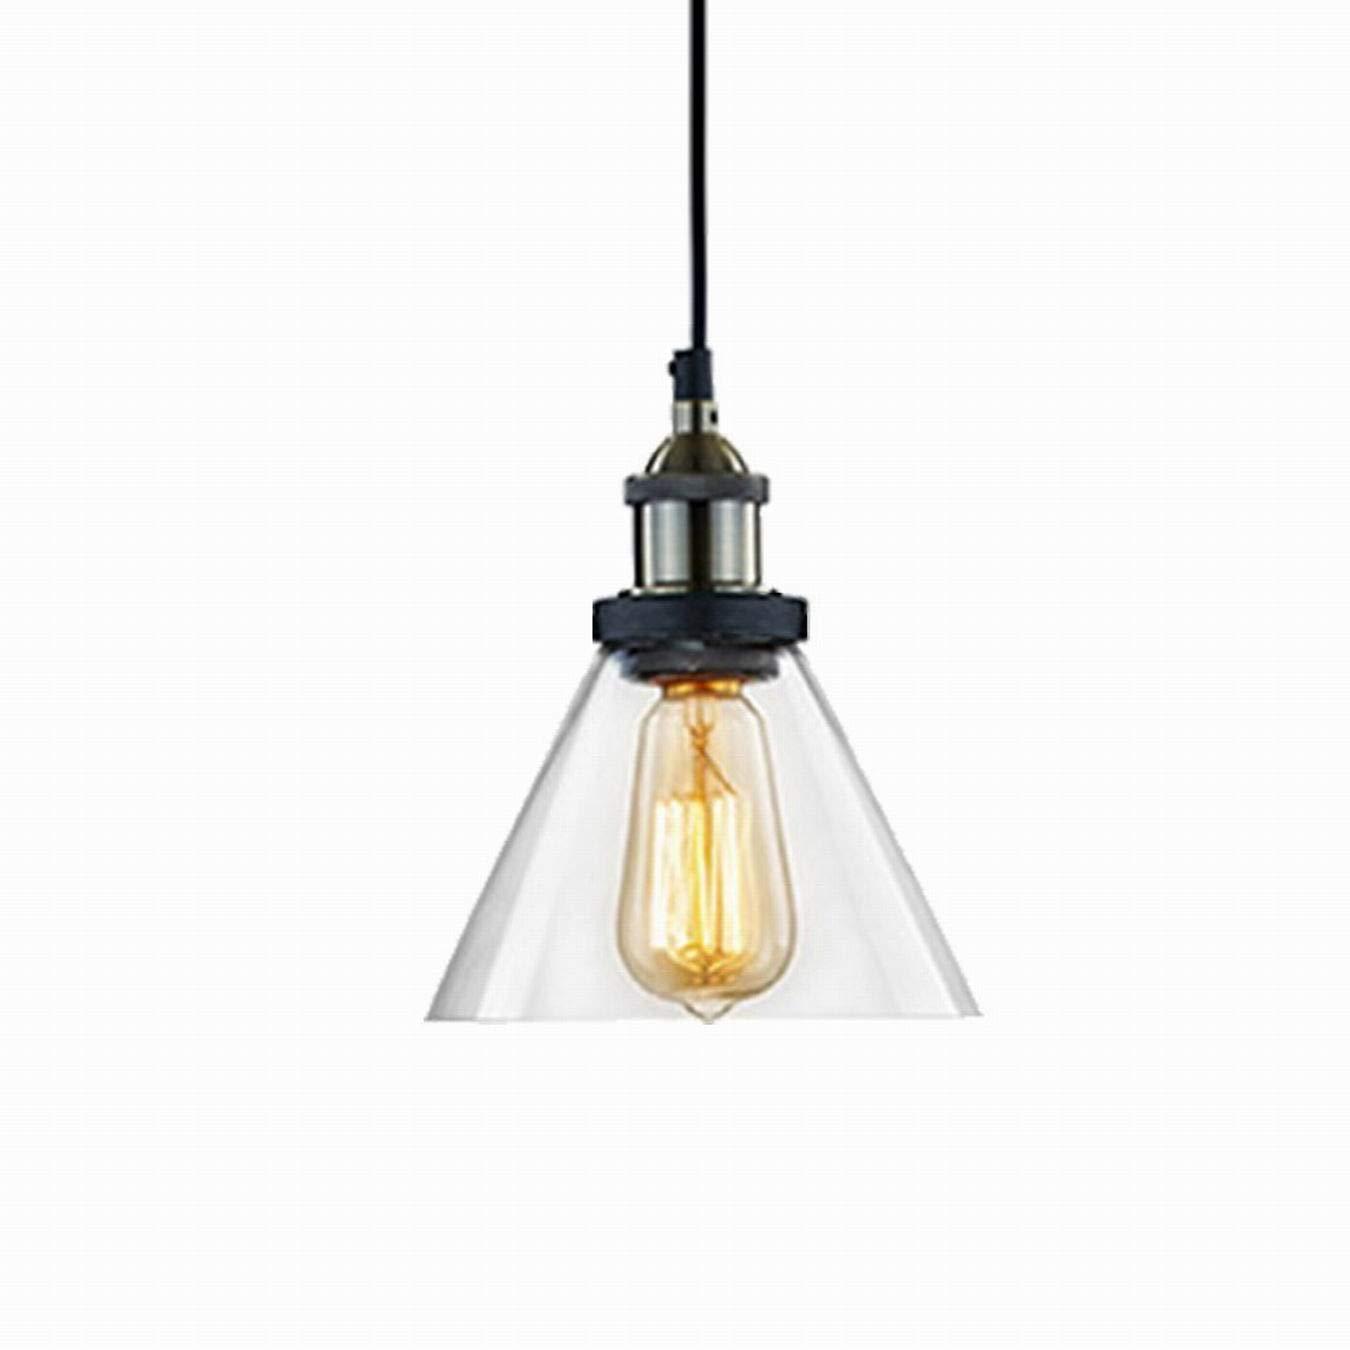 CLAXY Industrial Loft Clear Glass Ceiling L& Shade Pendant Light  sc 1 st  Amazon UK & Vintage Style Bathroom Lighting: Amazon.co.uk